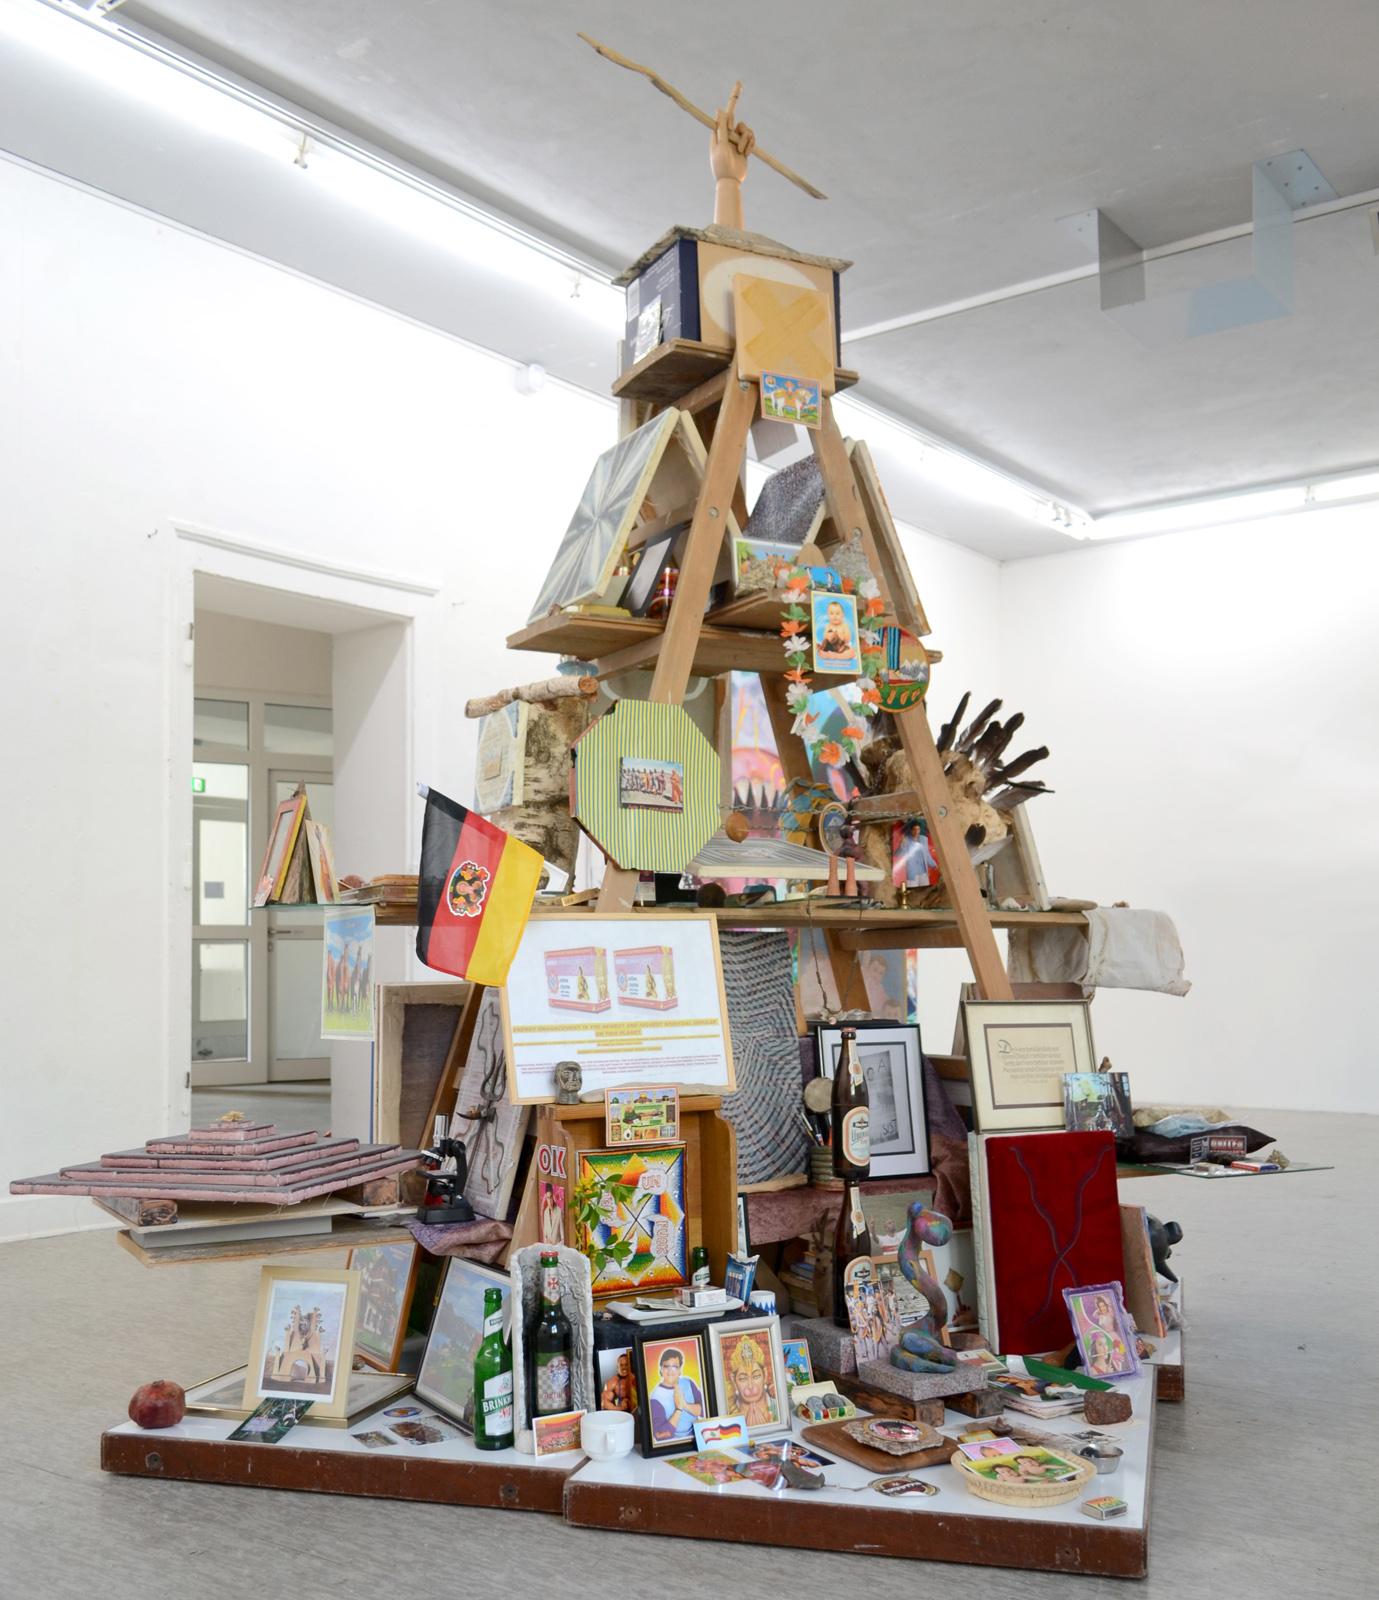 Michel Aniol Objects Installation Art Artist